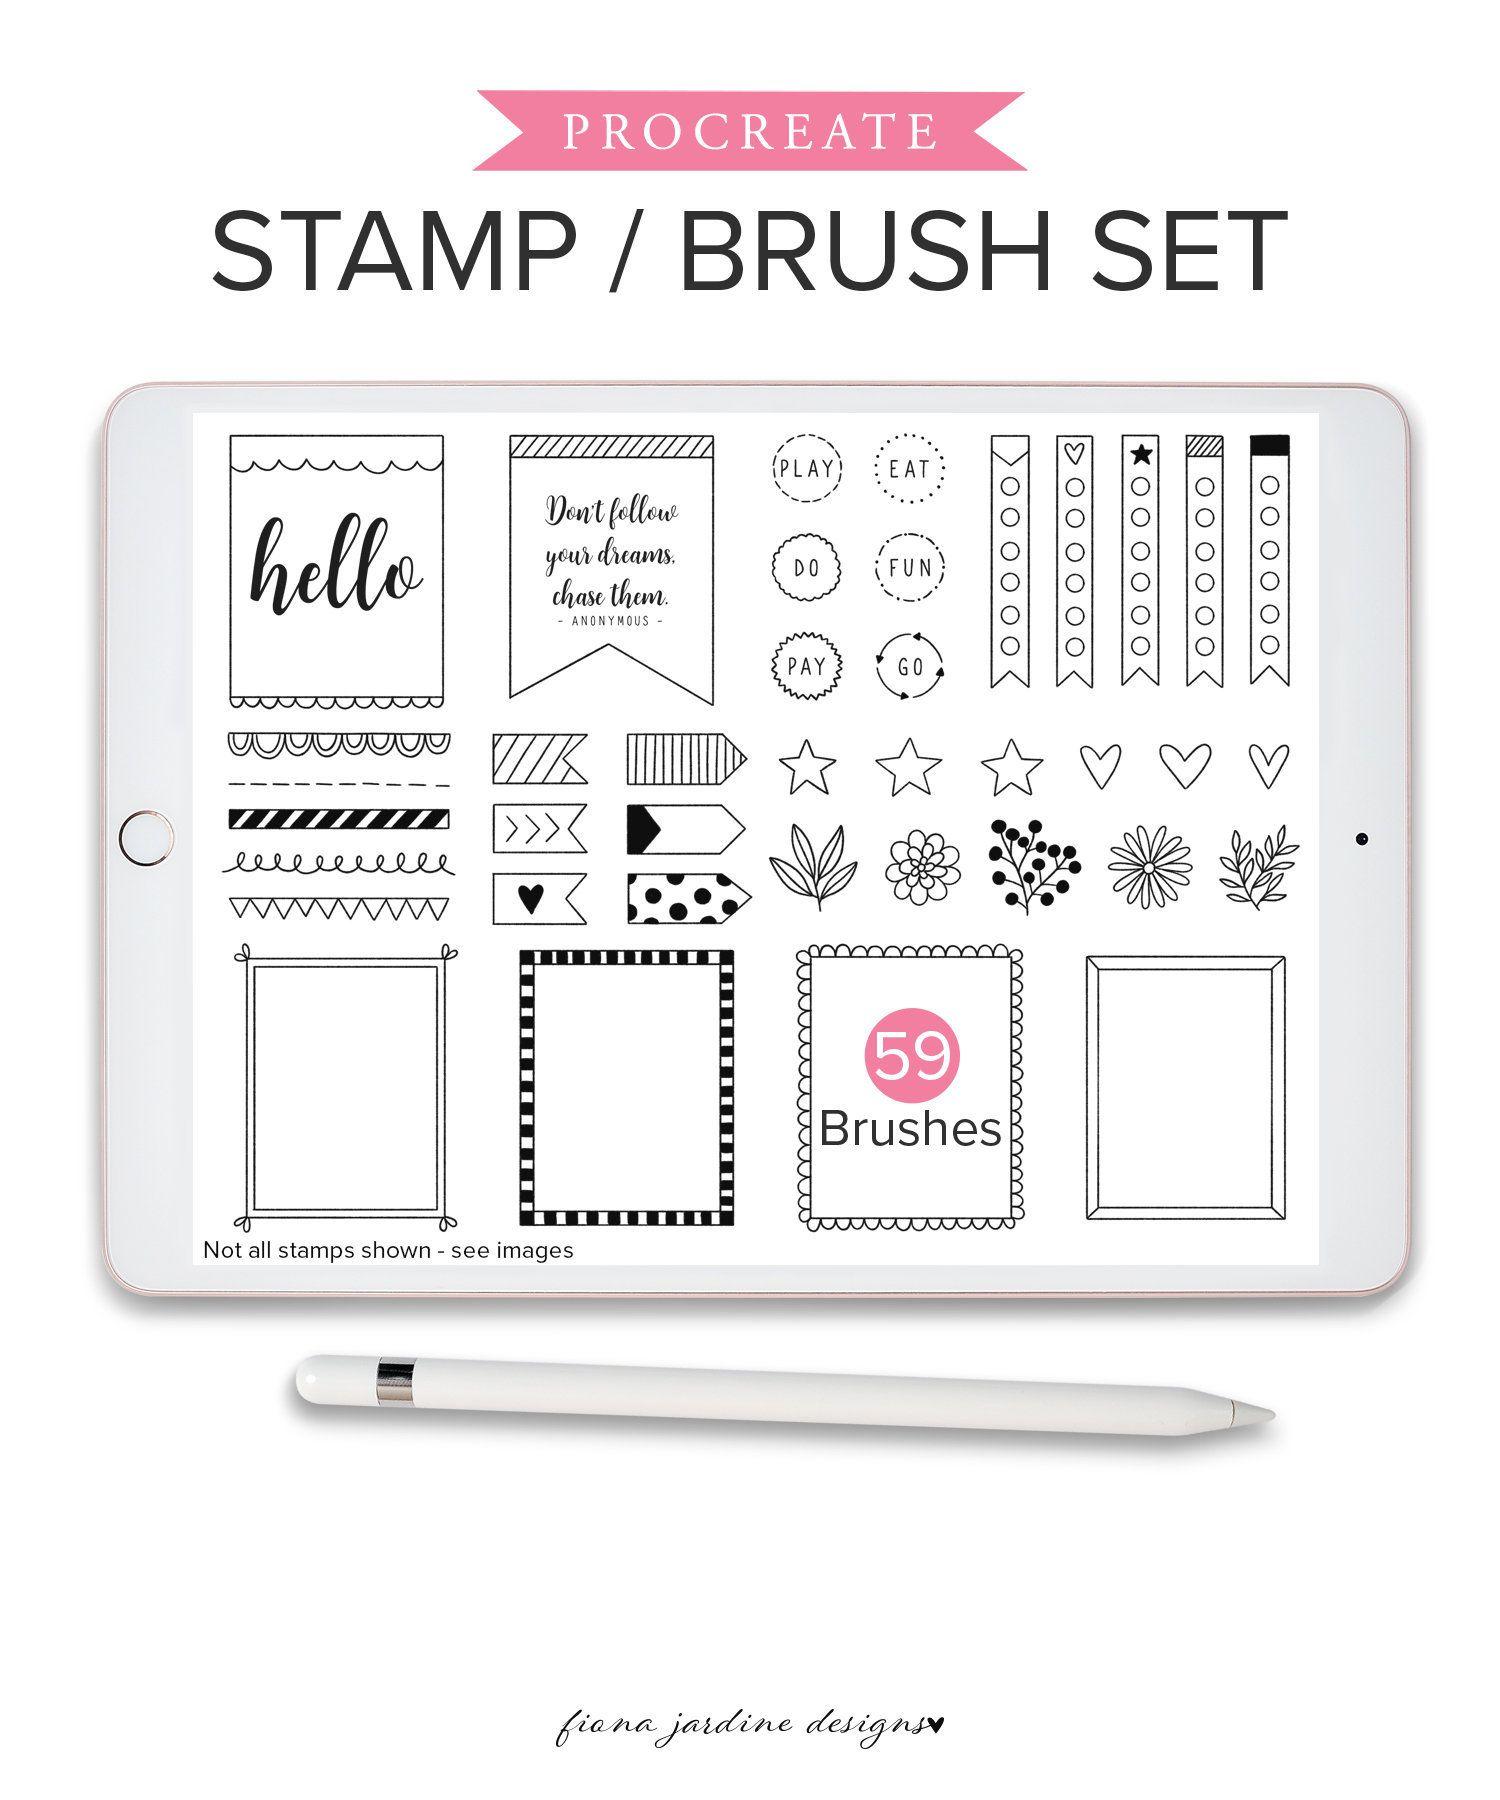 Procreate Bullet Journal Stamp Set Procreate Brushes Full Procreate Brush Set of Journaling Doodles